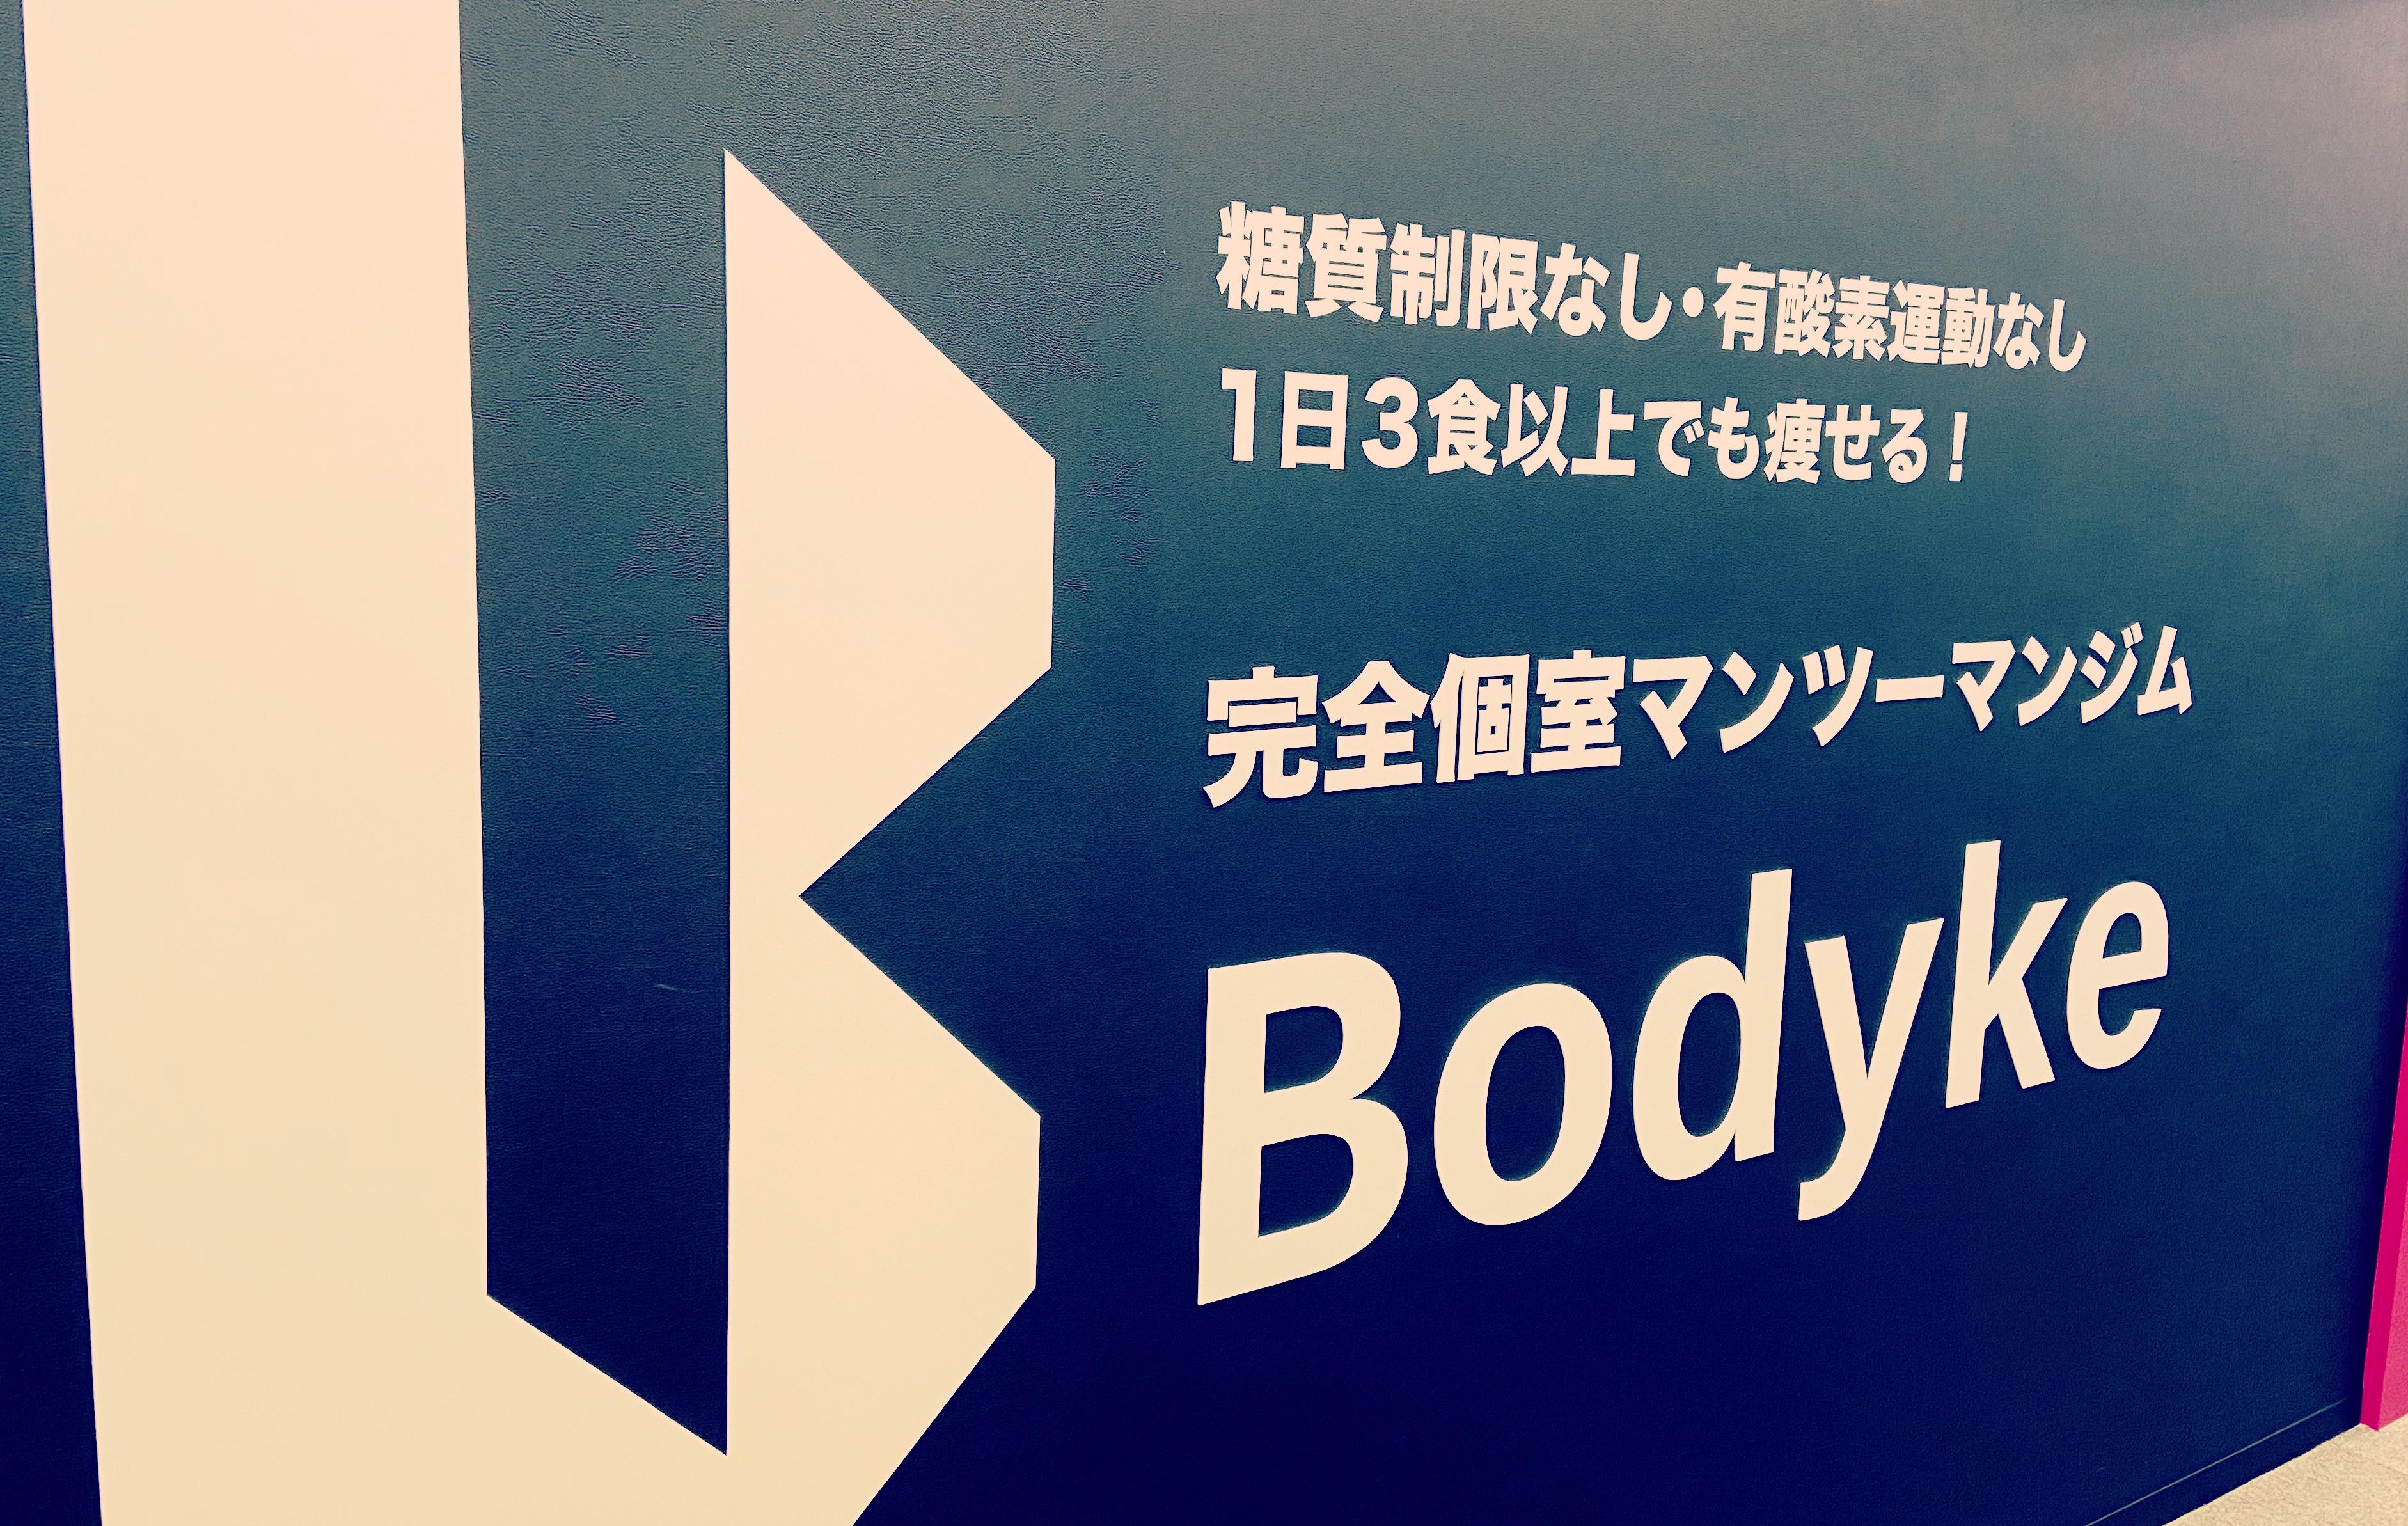 Bodyke(ボディーク)秋葉原店